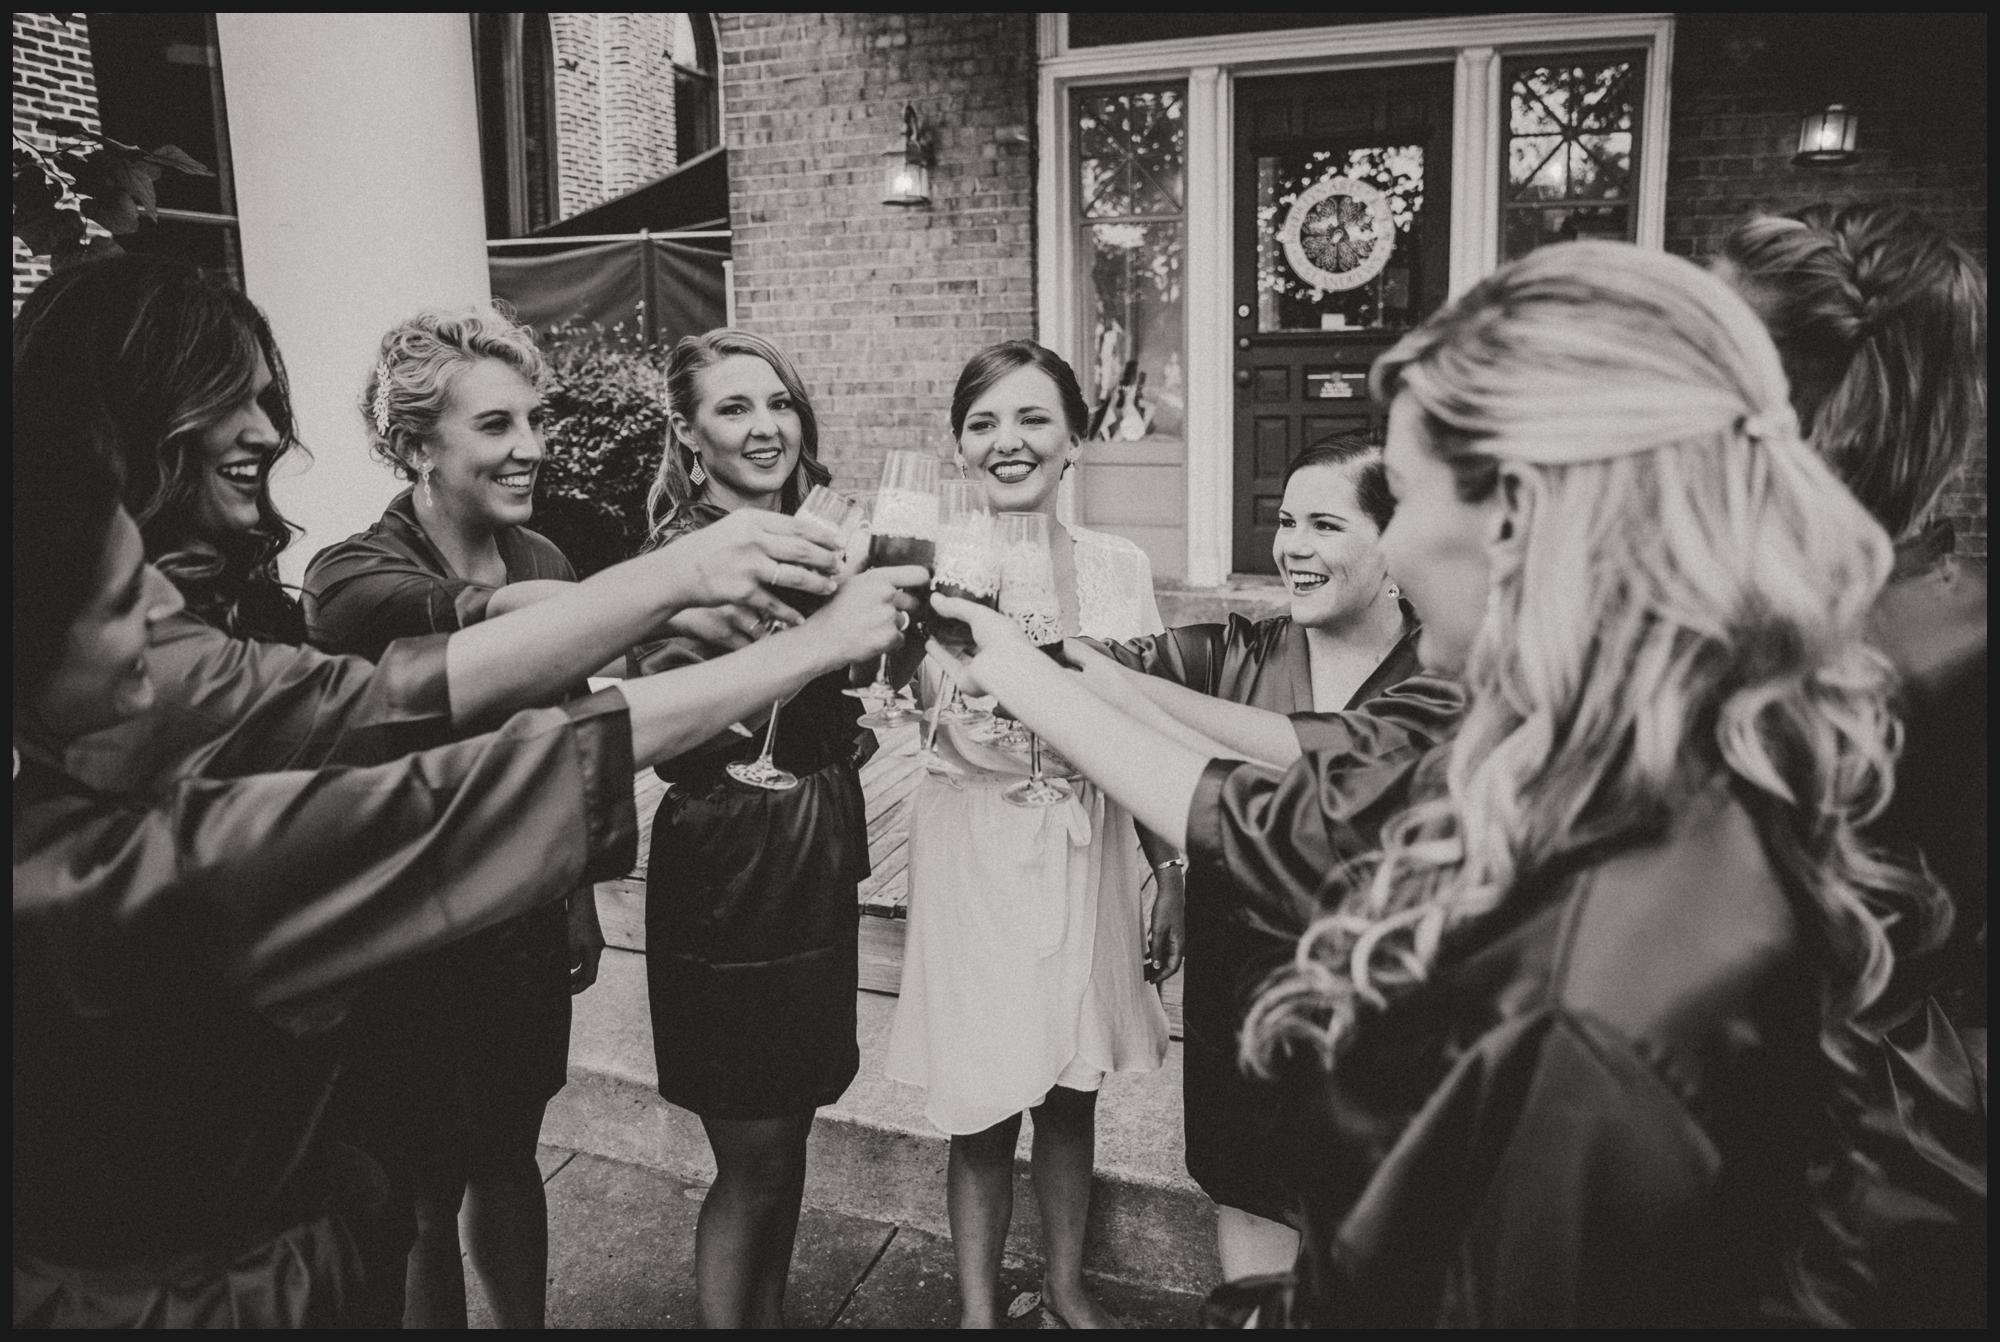 Orlando-Wedding-Photographer-destination-wedding-photographer-florida-wedding-photographer-bohemian-wedding-photographer_0594.jpg